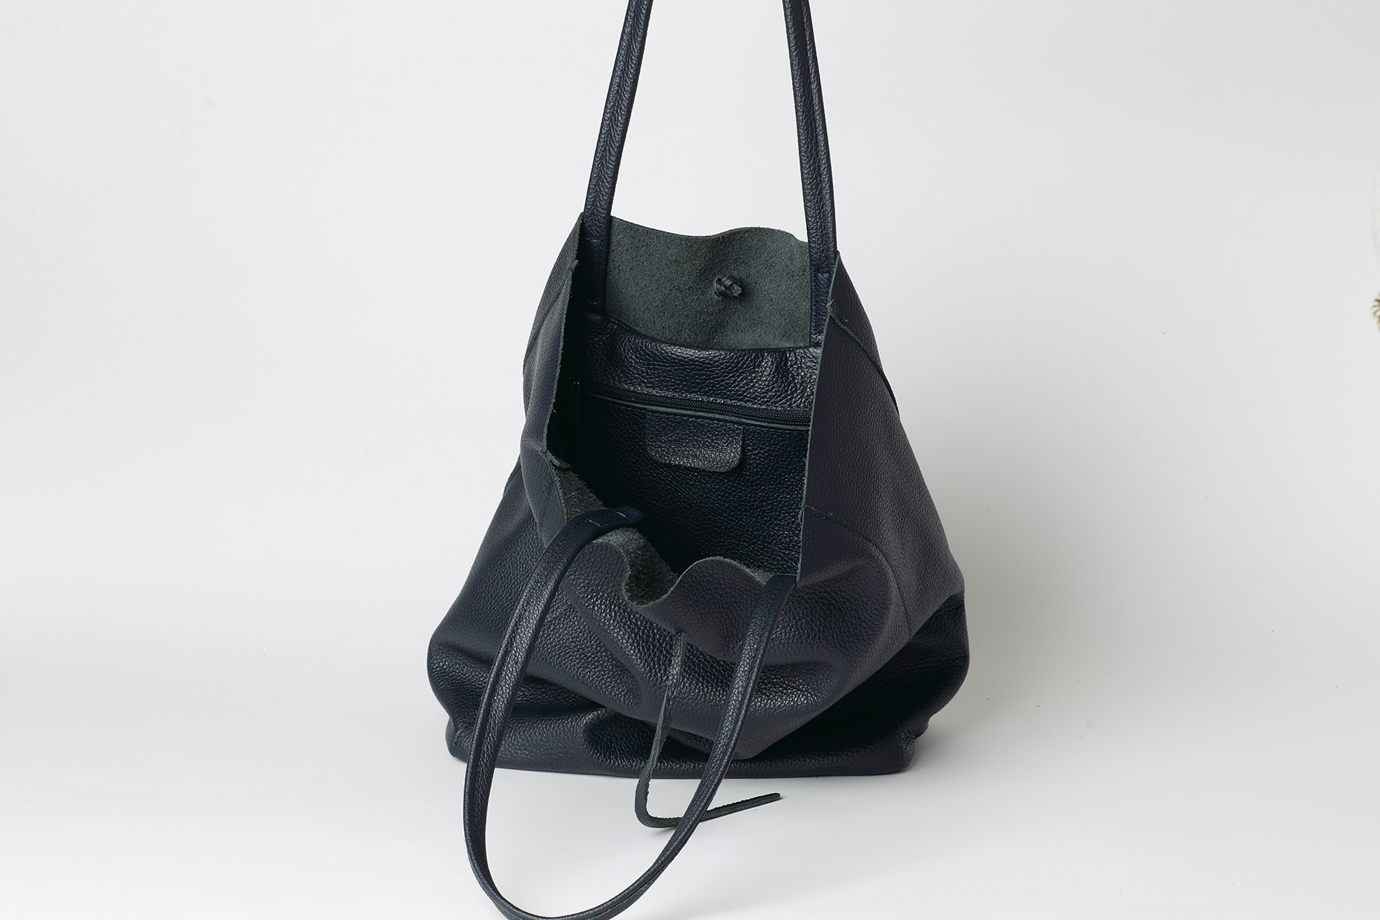 Кожаная сумка Luna в стиле Tote.  Доставка 7/10 дней